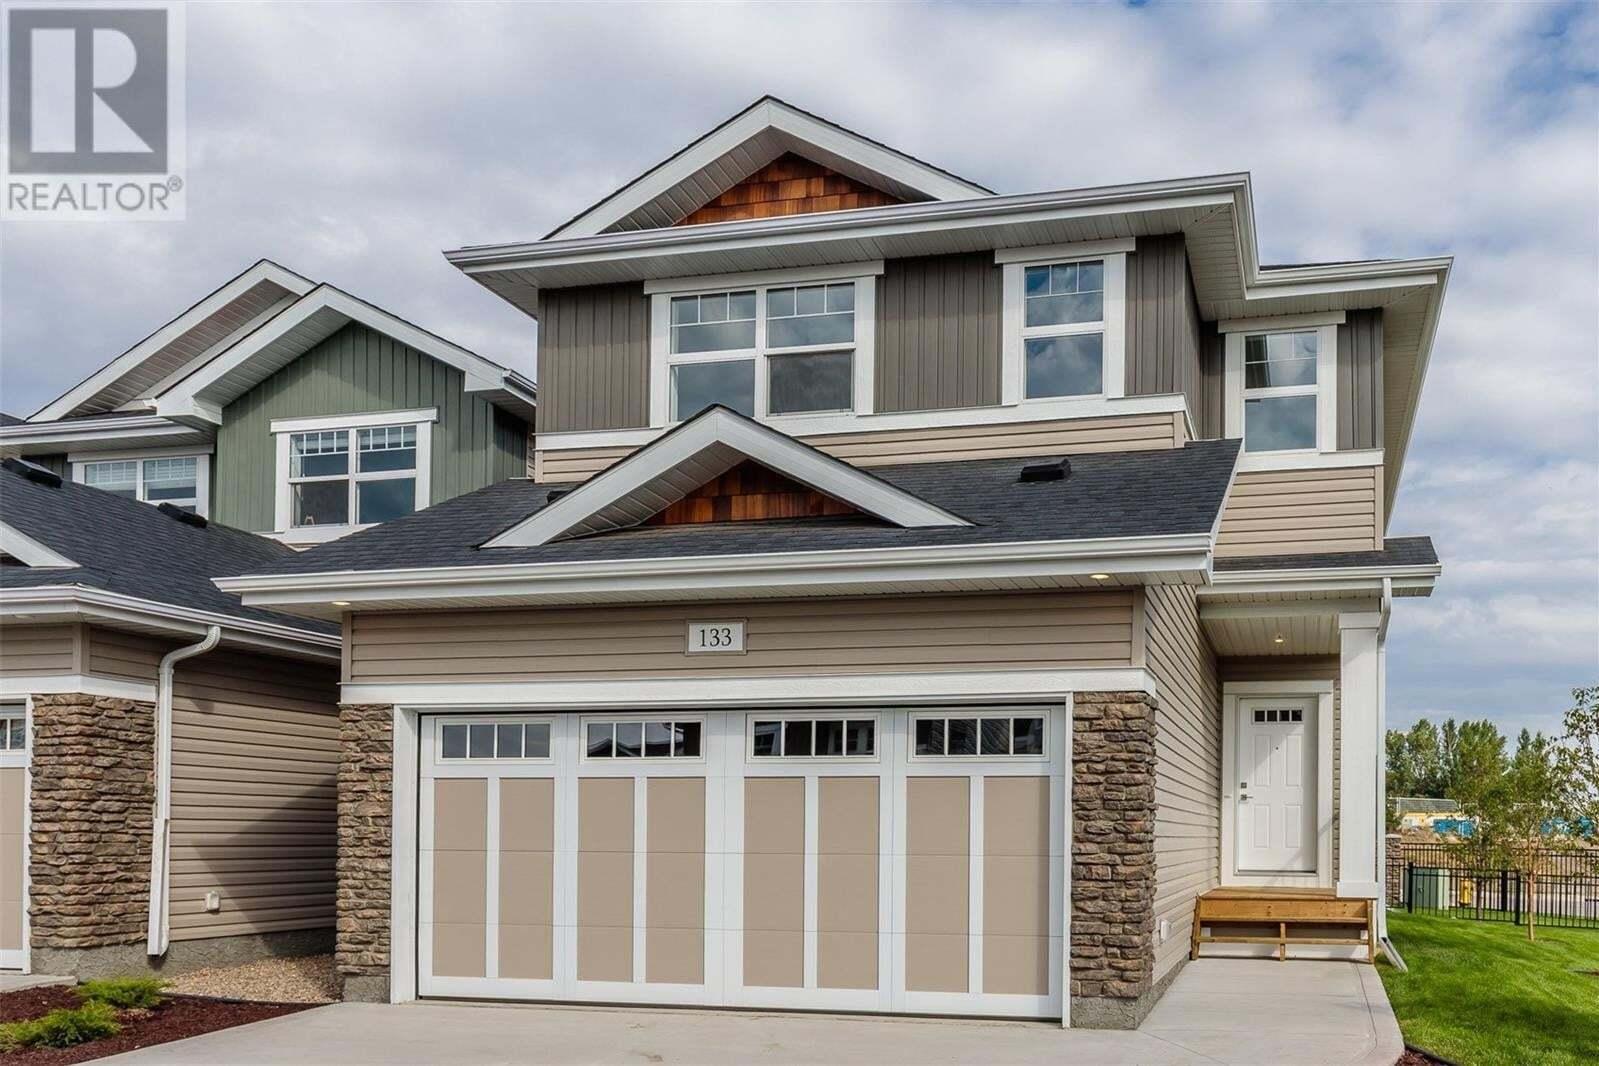 House for sale at 315 Dickson Cres Unit 119 Saskatoon Saskatchewan - MLS: SK810906